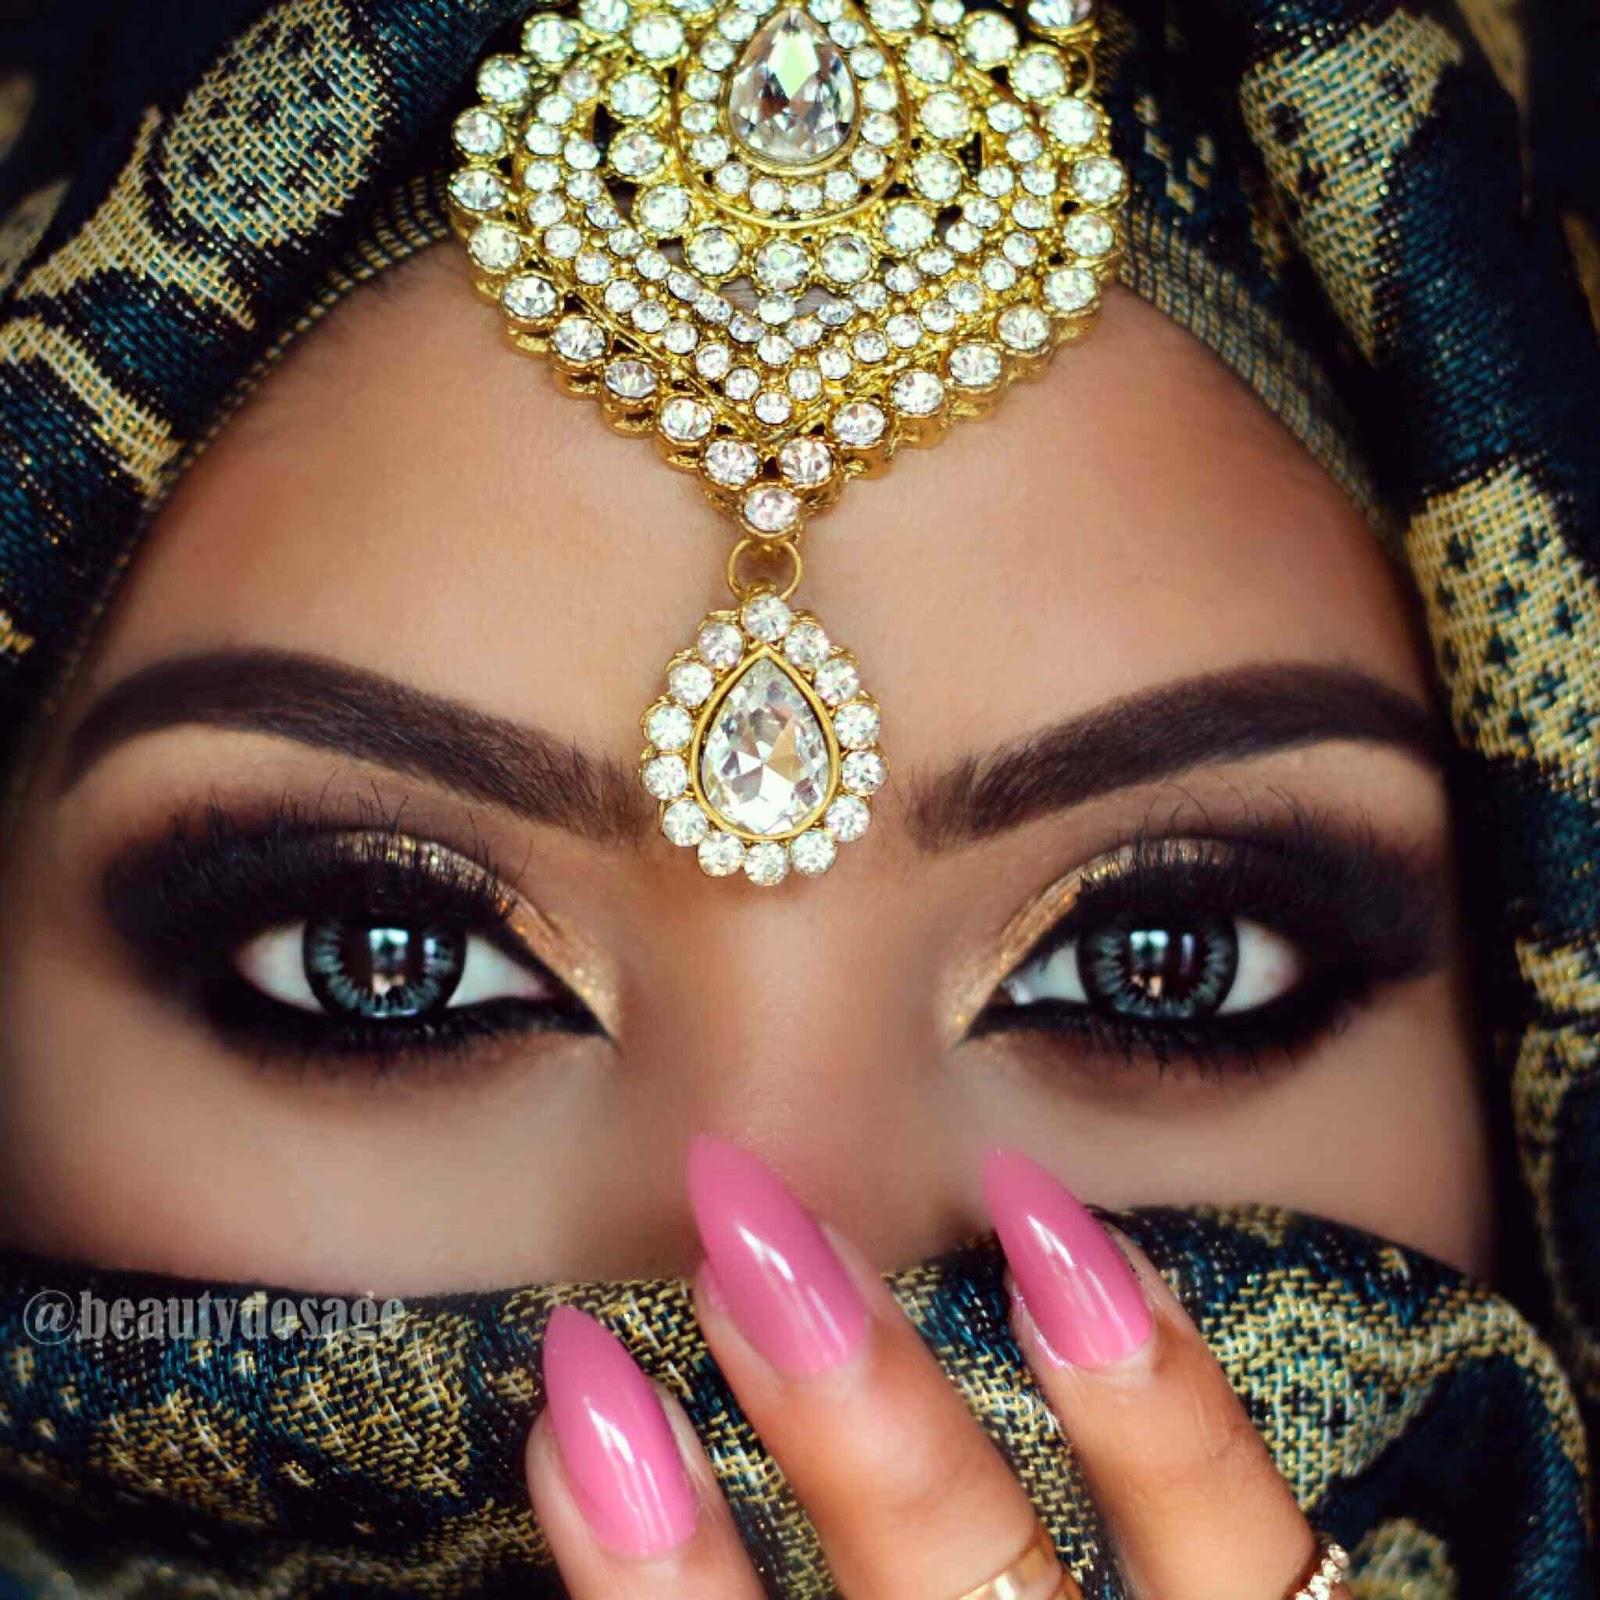 Huda Beauty Eyelashes #7 'Samantha' Review, Photos & Eye ...